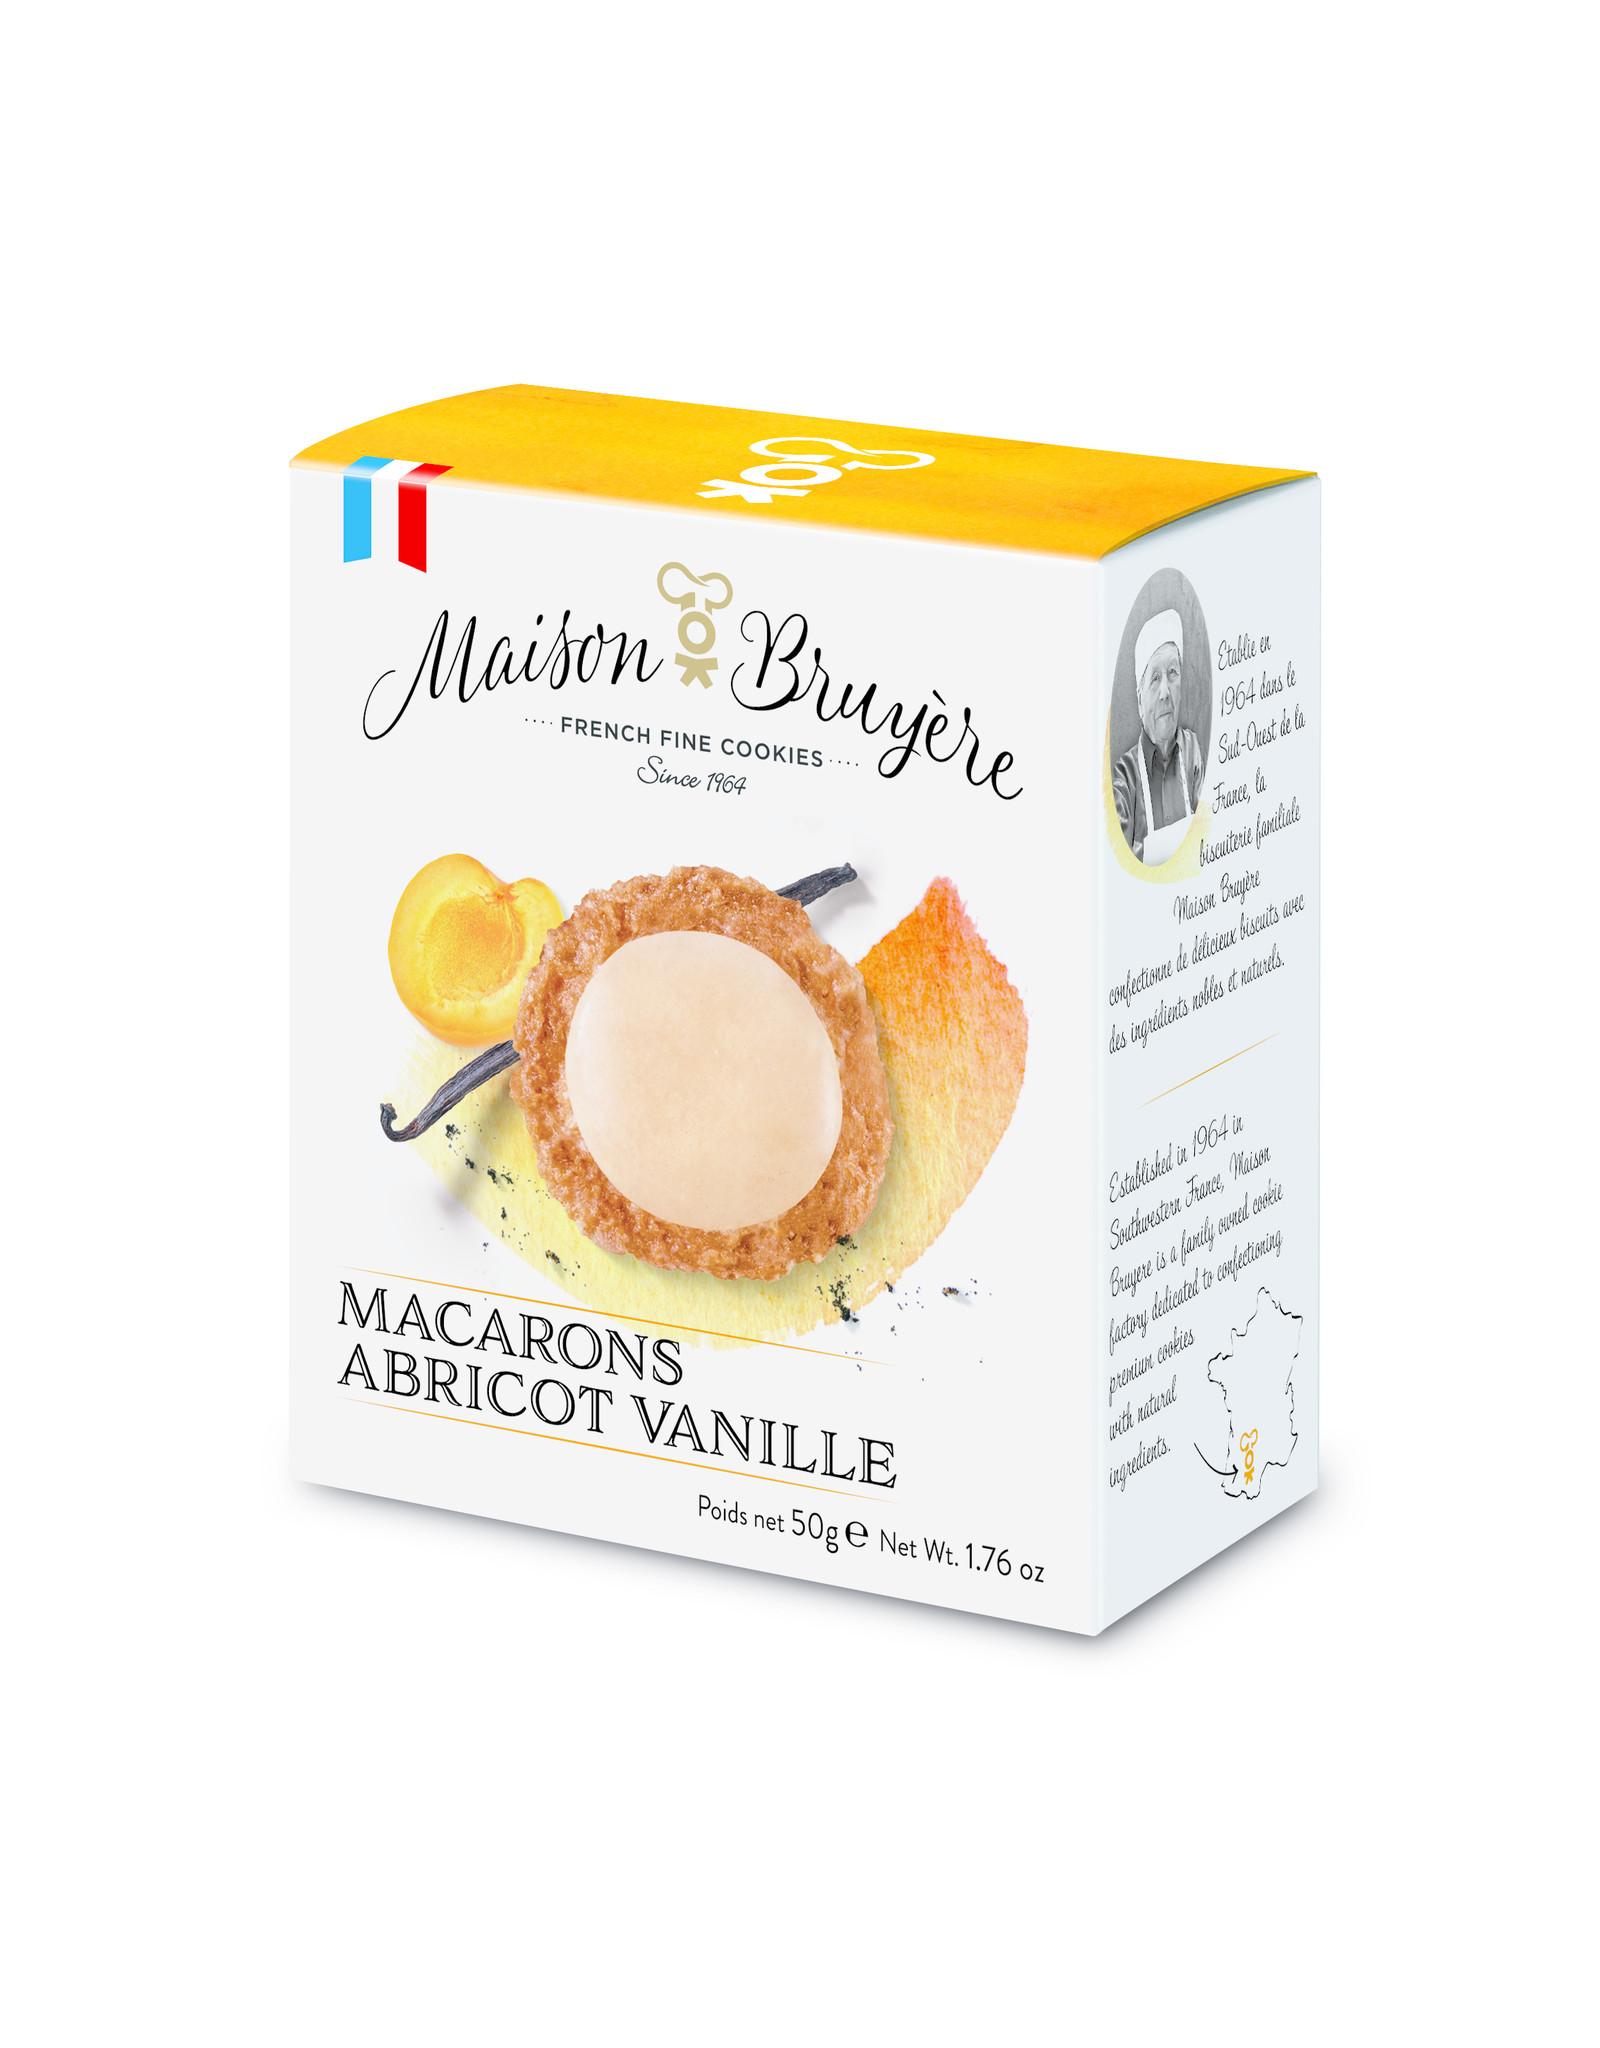 Maison Bruyere Apricot vanilla macaroons 50g